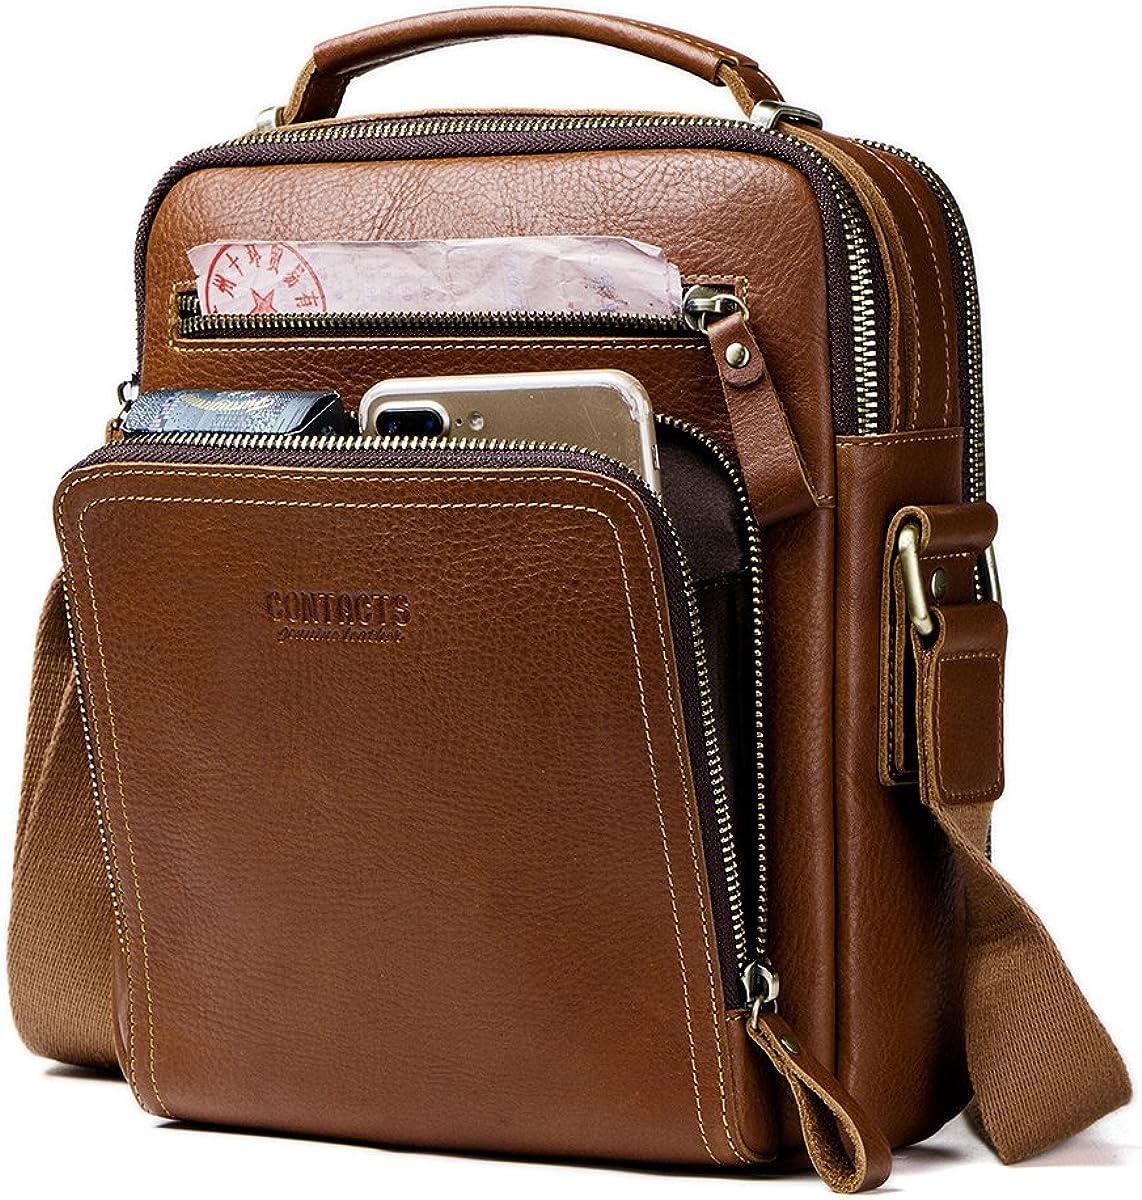 Contacts Cuero real para hombre iPad Mini Tab Messenger CrossBody bolso de mano marrón